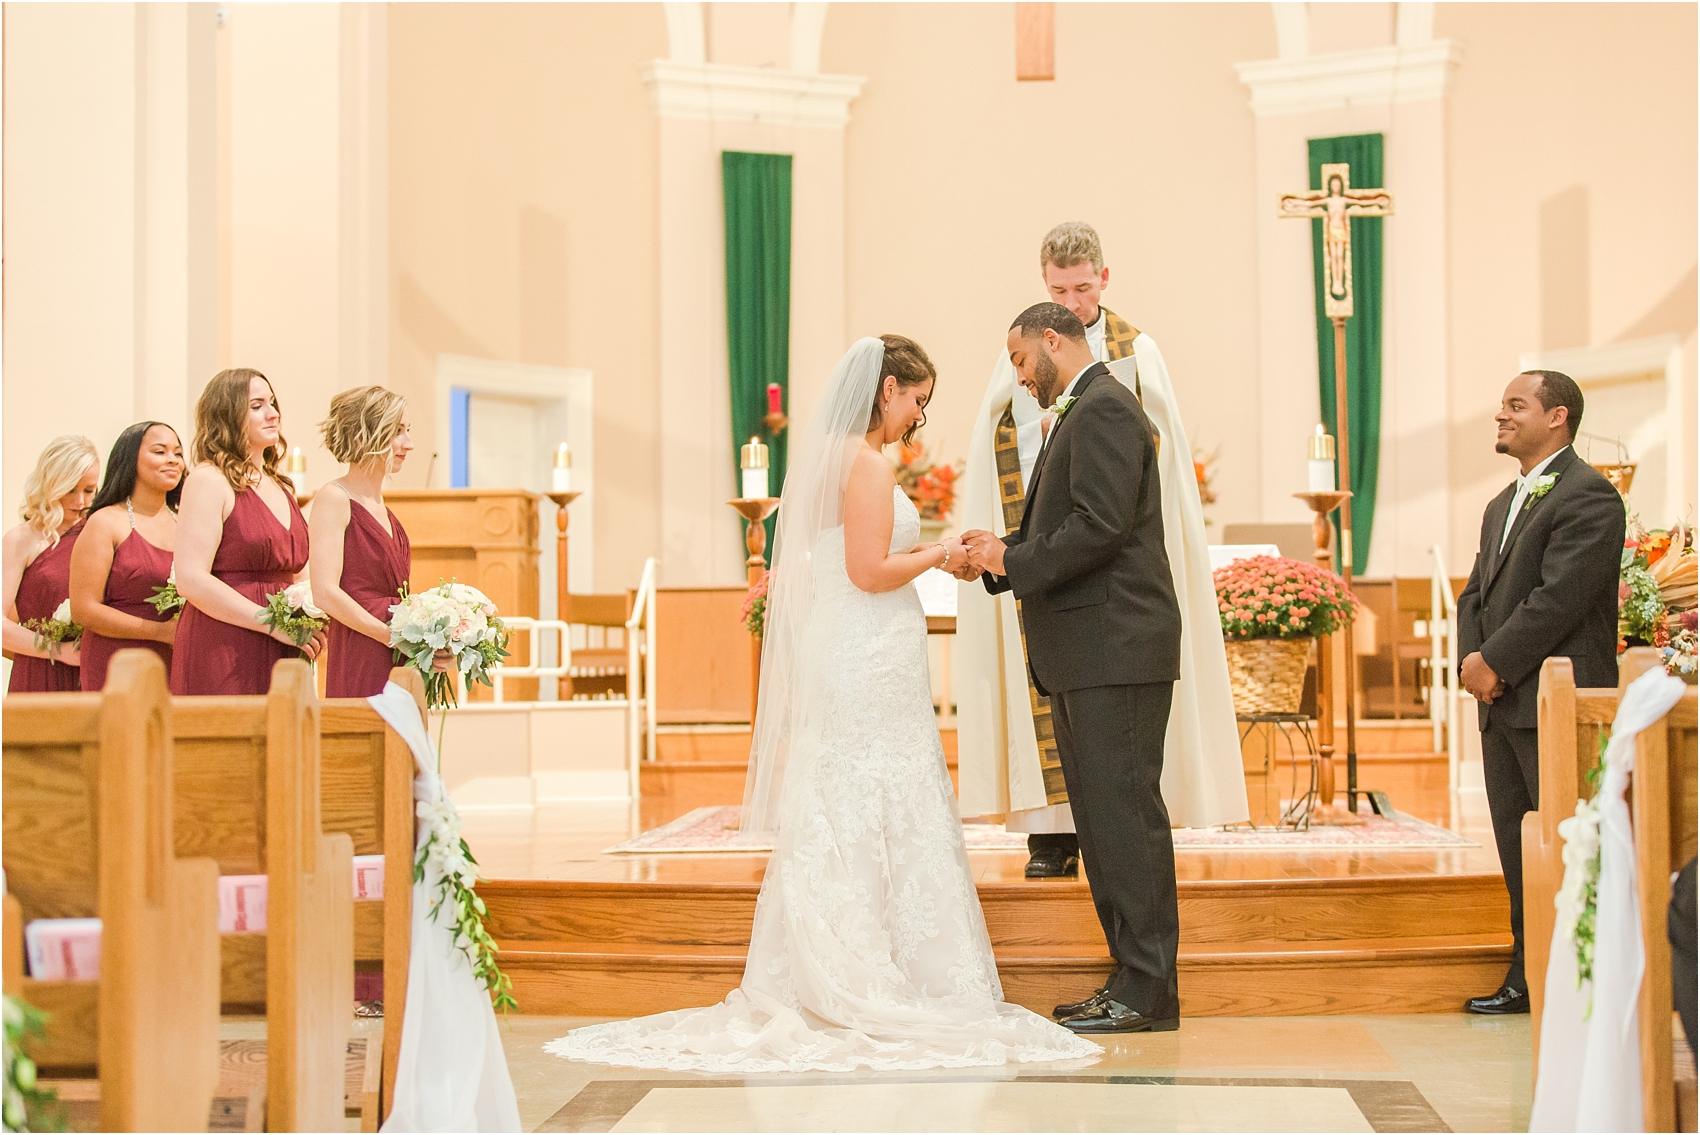 elegant-and-romantic-fall-wedding-photos-at-st-marys-catholic-church-in-monroe-michigan-by-courtney-carolyn-photography_0023.jpg